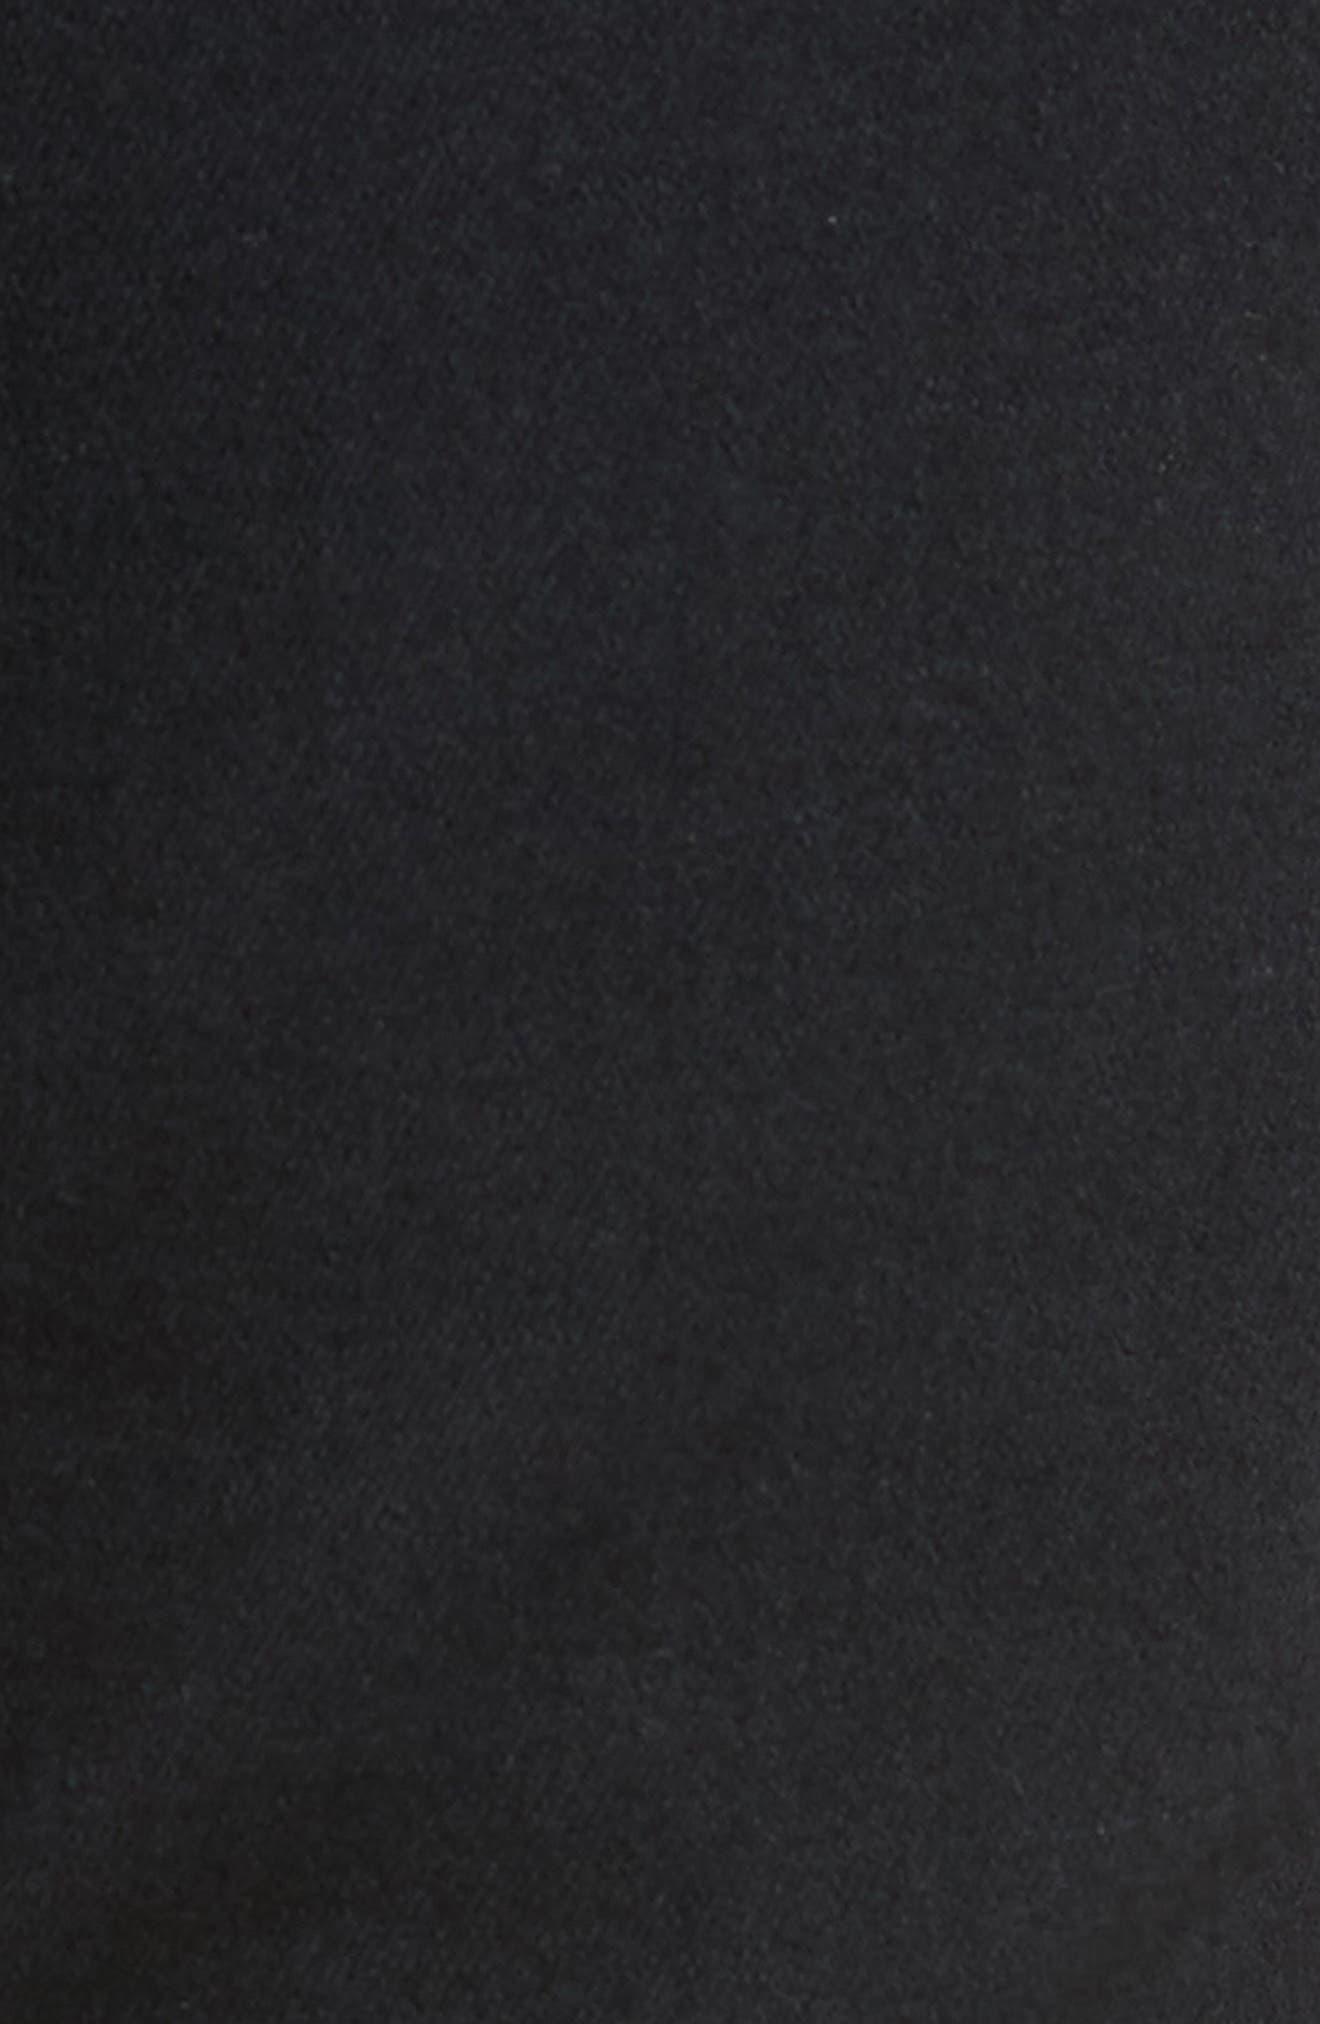 Super Skinny Guy Skinny Fit Jeans,                             Alternate thumbnail 5, color,                             Black